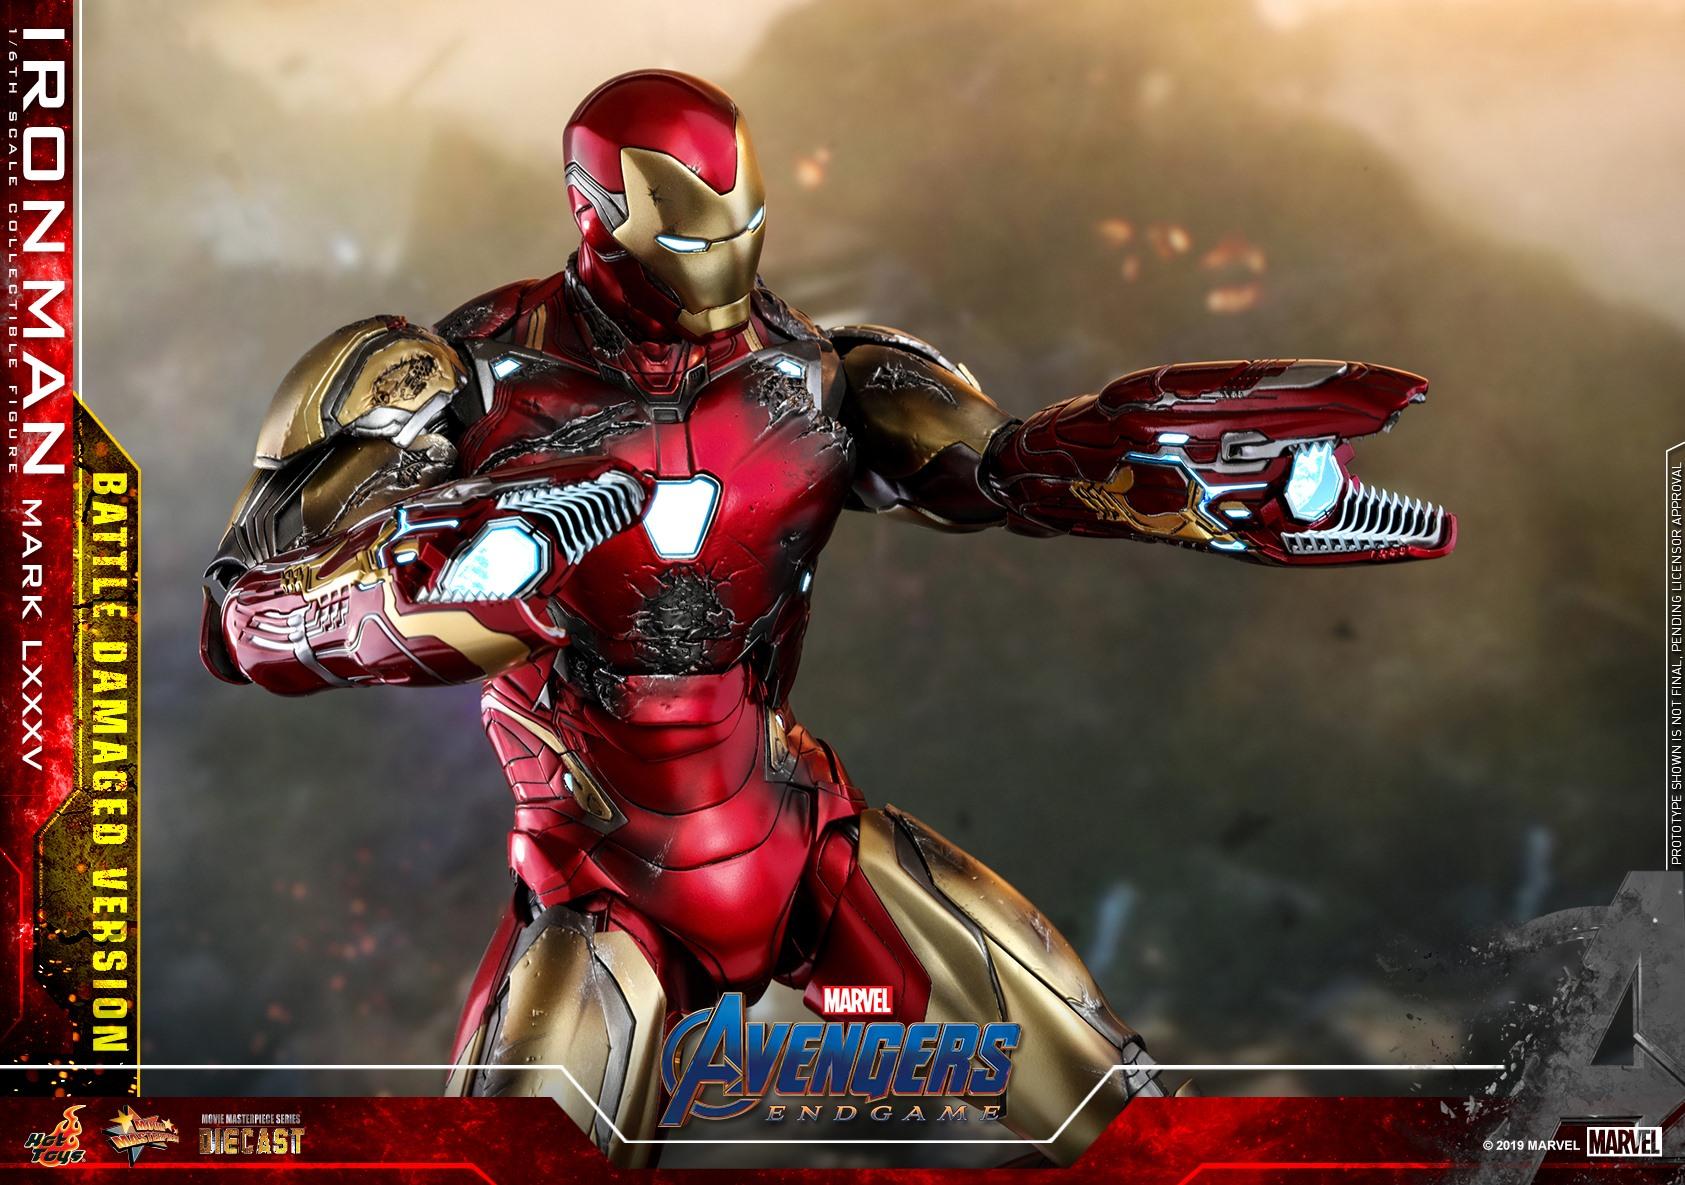 Hot toys Iron man Mark LXXXV Battle Damaged Version